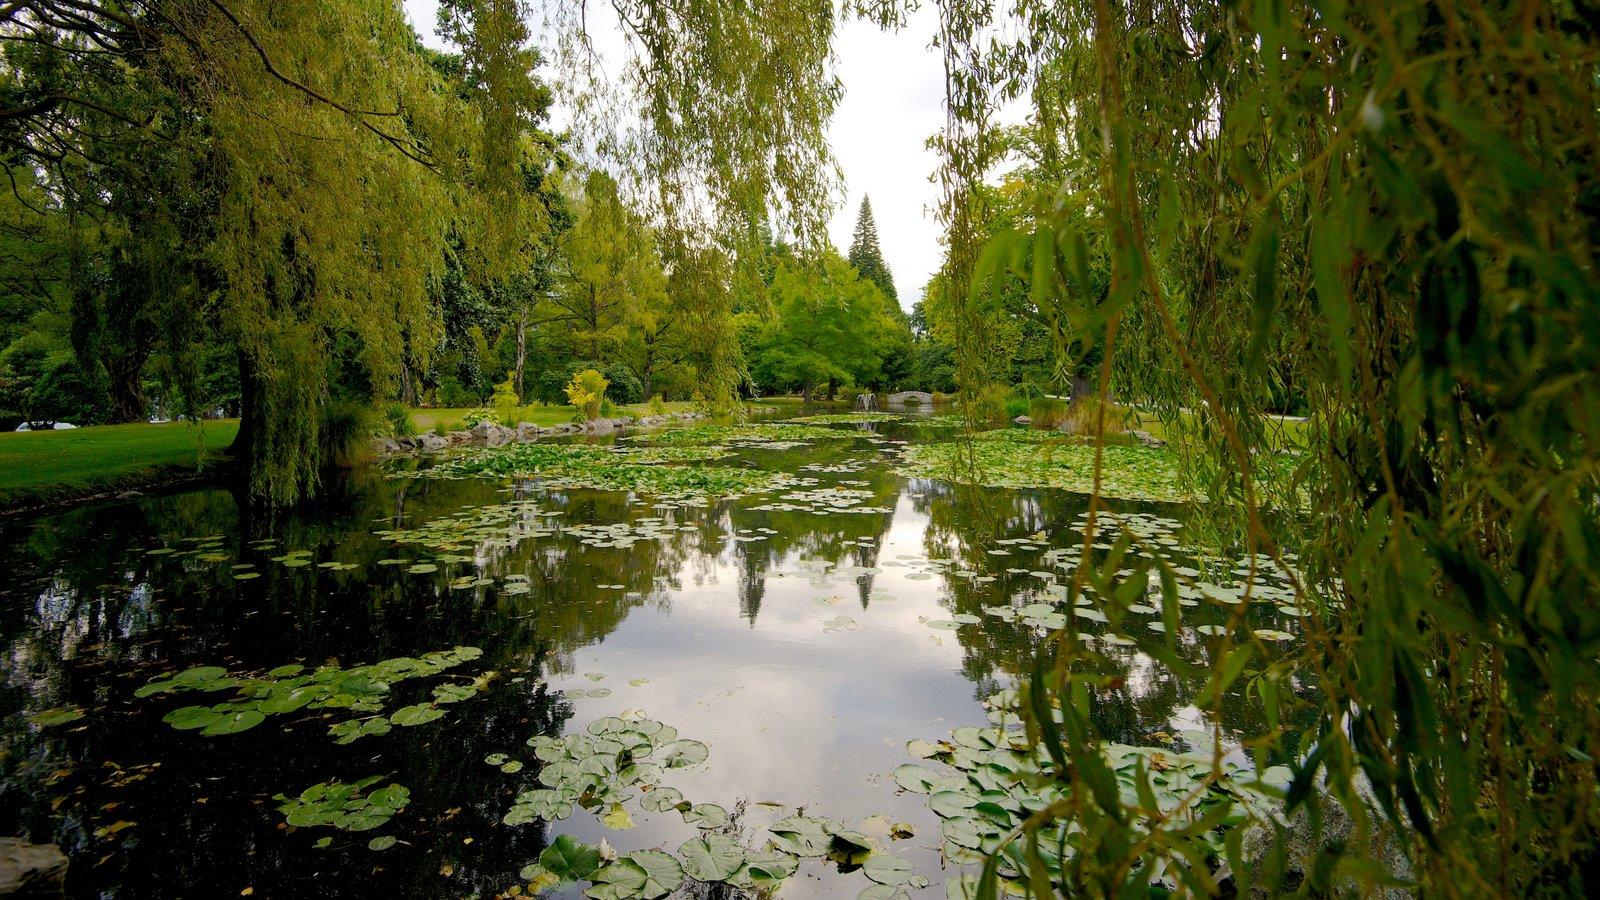 Queenstown Gardens which includes a pond, landscape views and a garden